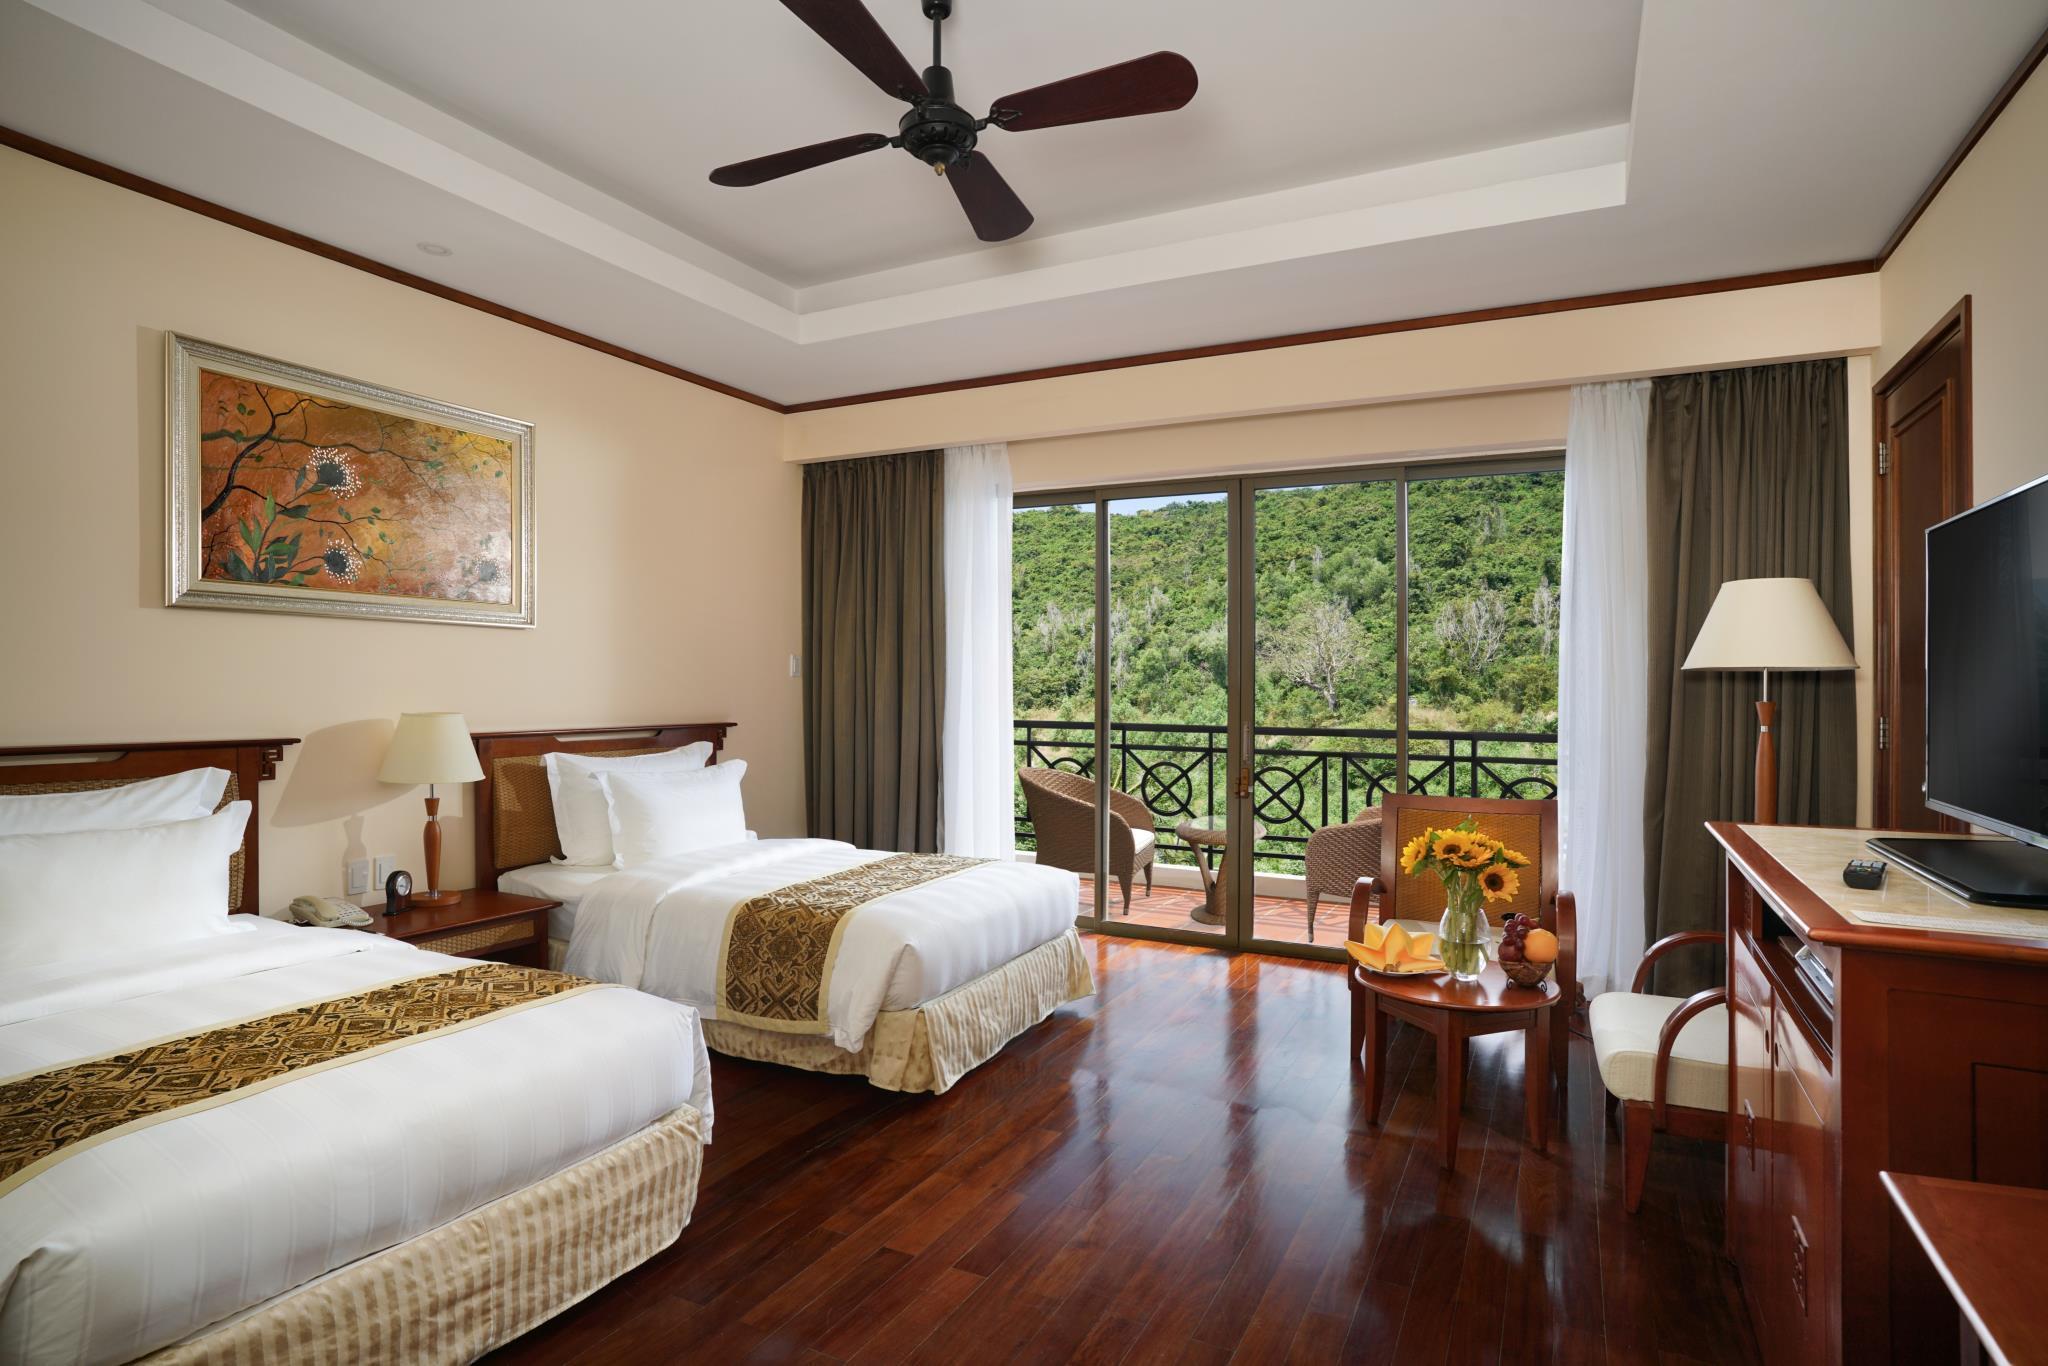 Vinpearl Luxury Nha Trang, Nha Trang